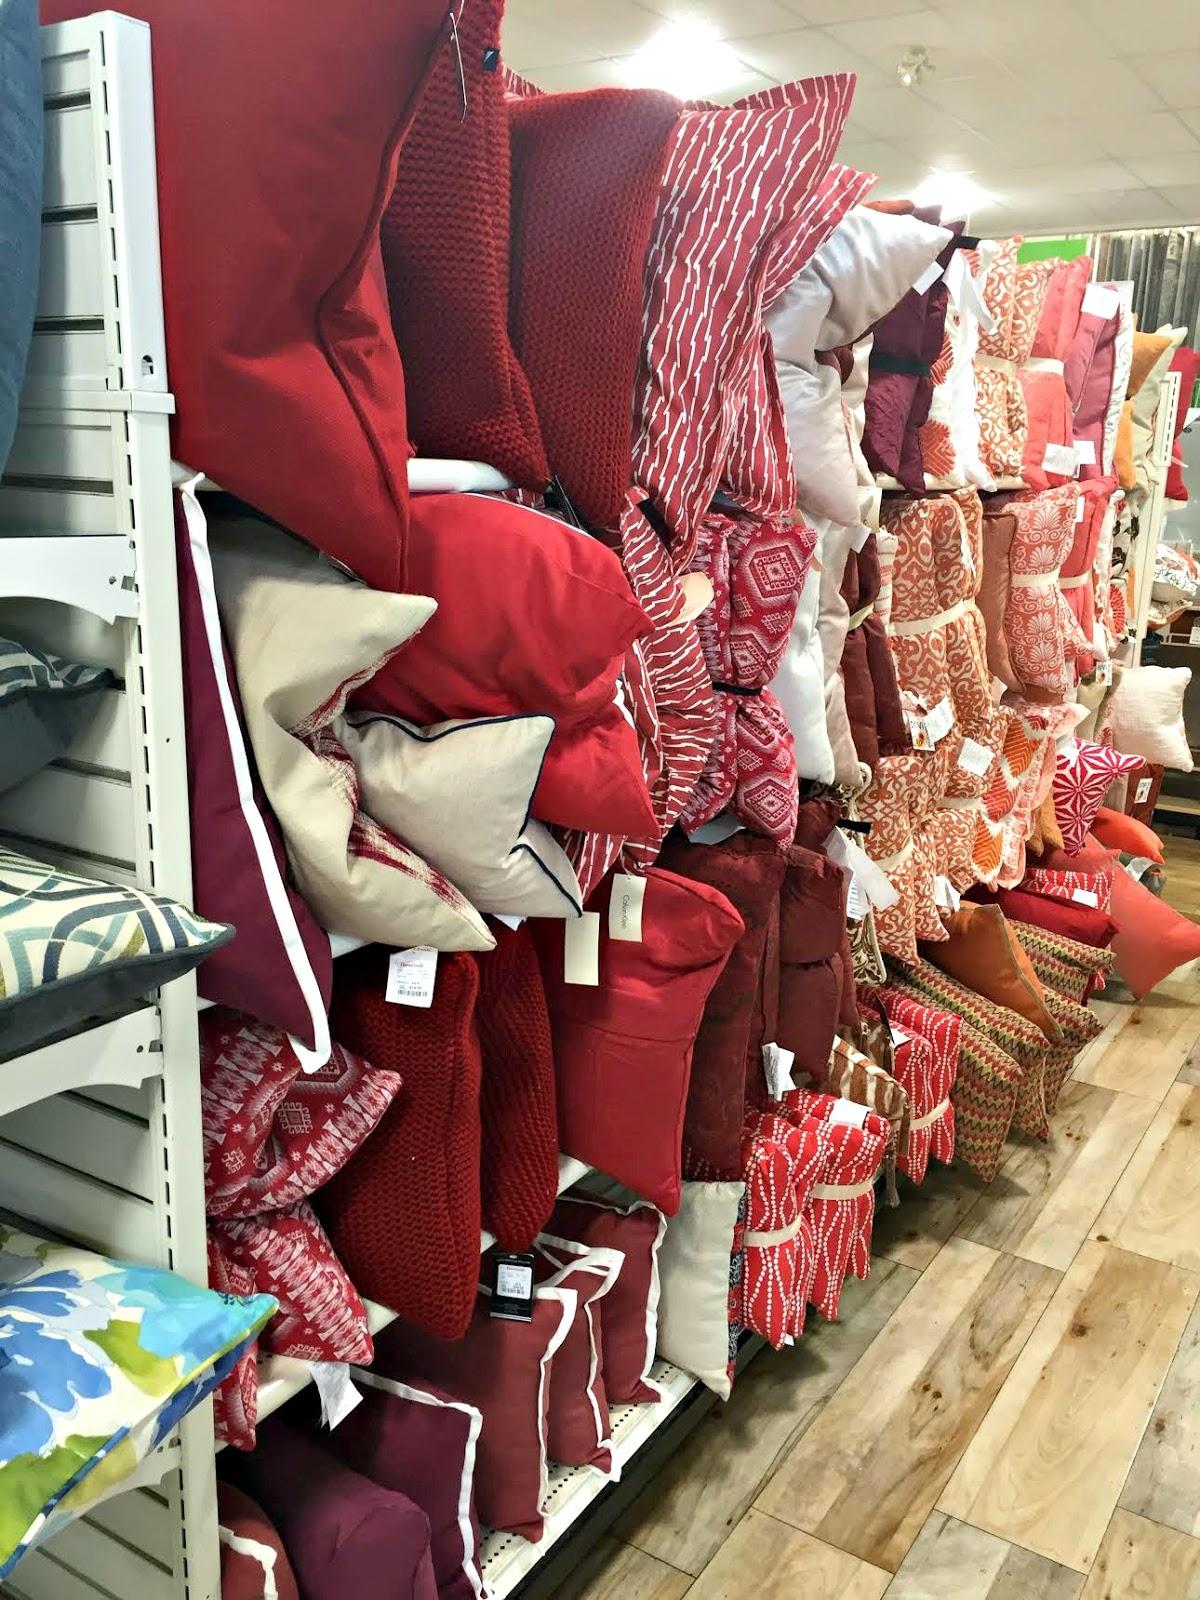 Home Goods Christmas Pillows : goods, christmas, pillows, Items, HomeGoods, Thrifty, Decor, Chick